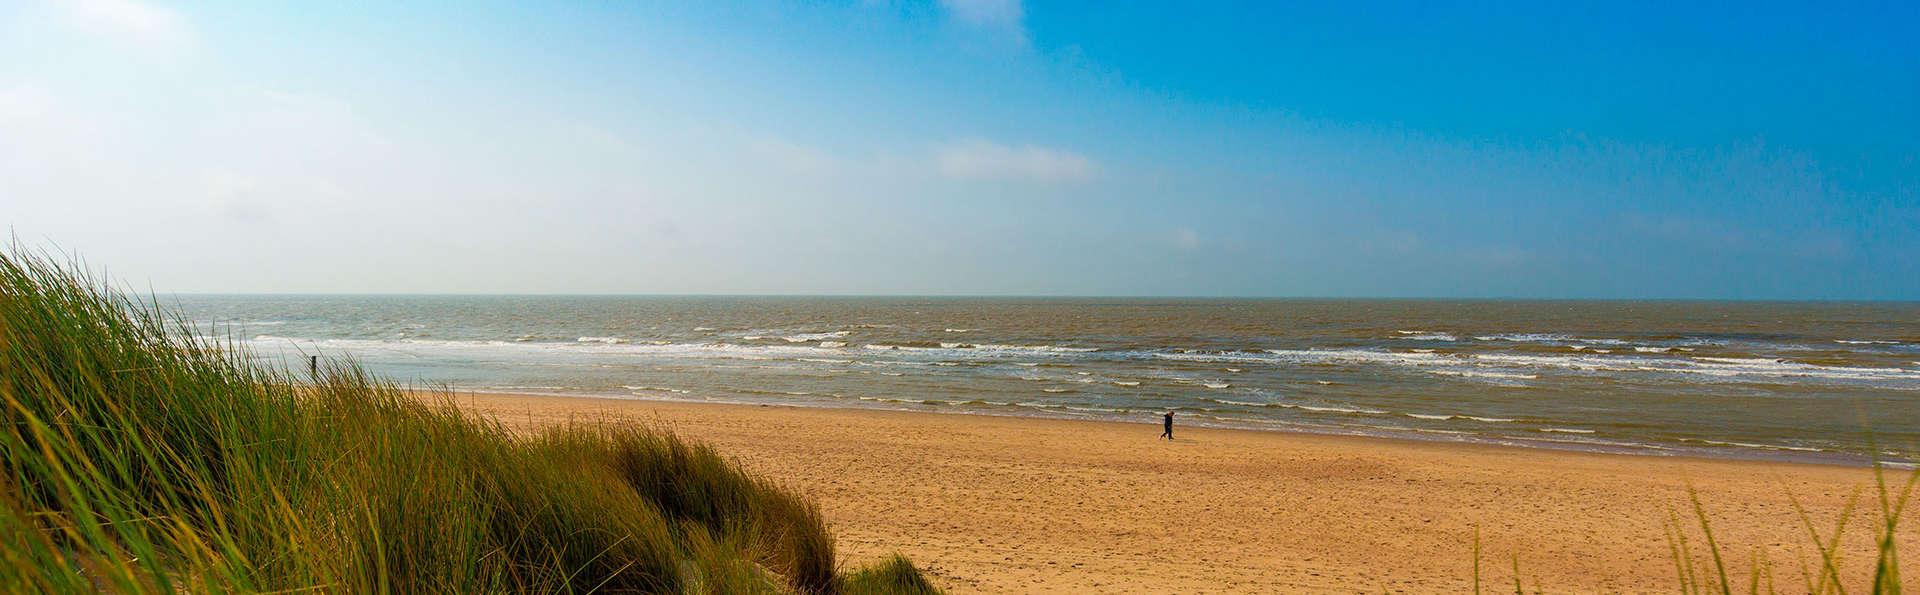 Explorez la côte belge